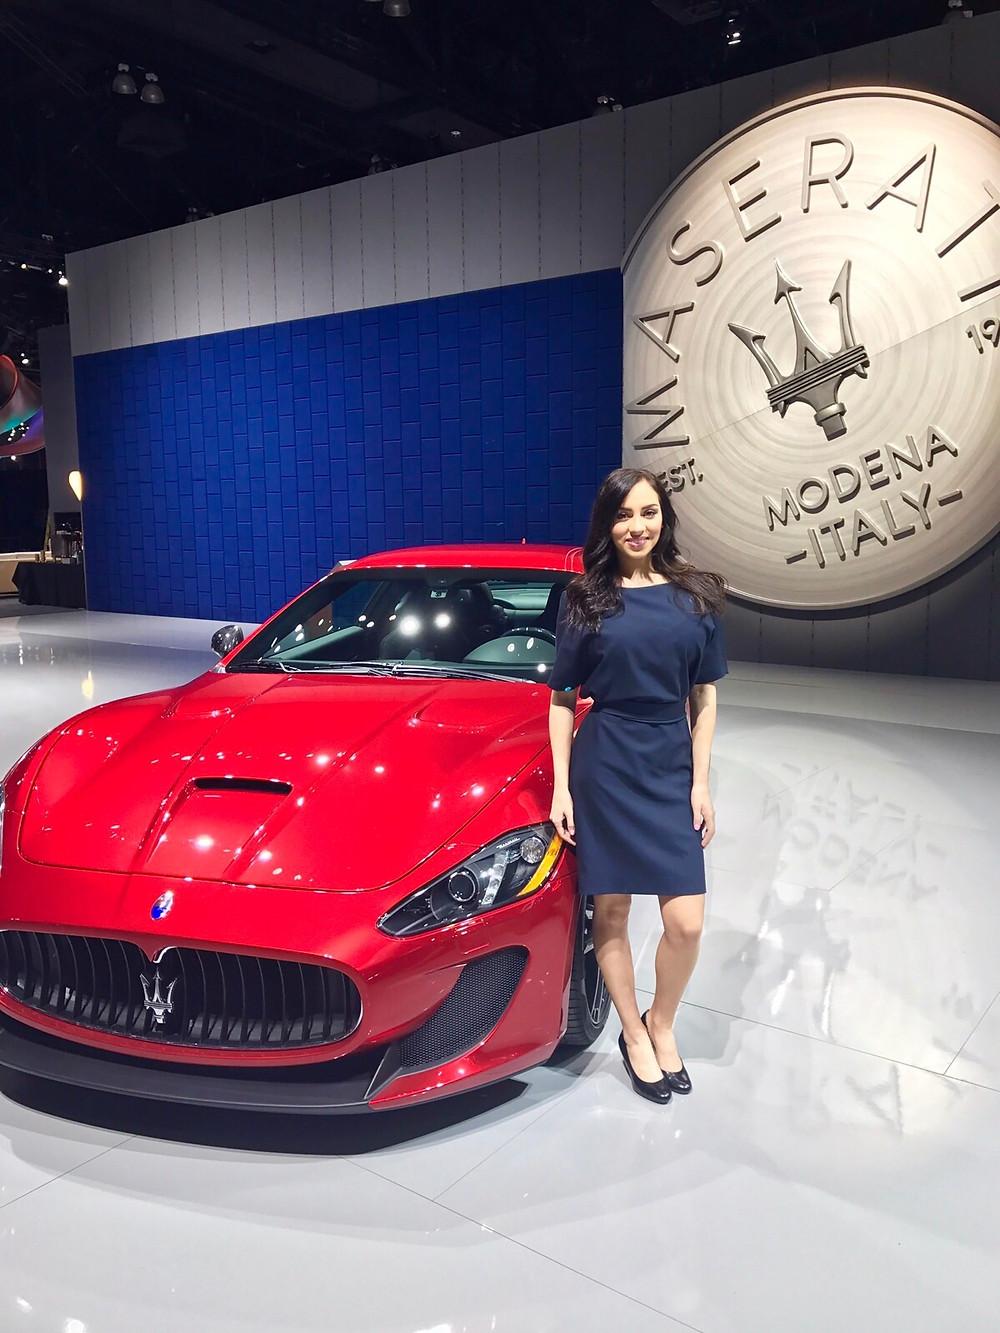 los angeles trade show models, los angeles convention models, la auto show models, attract agency